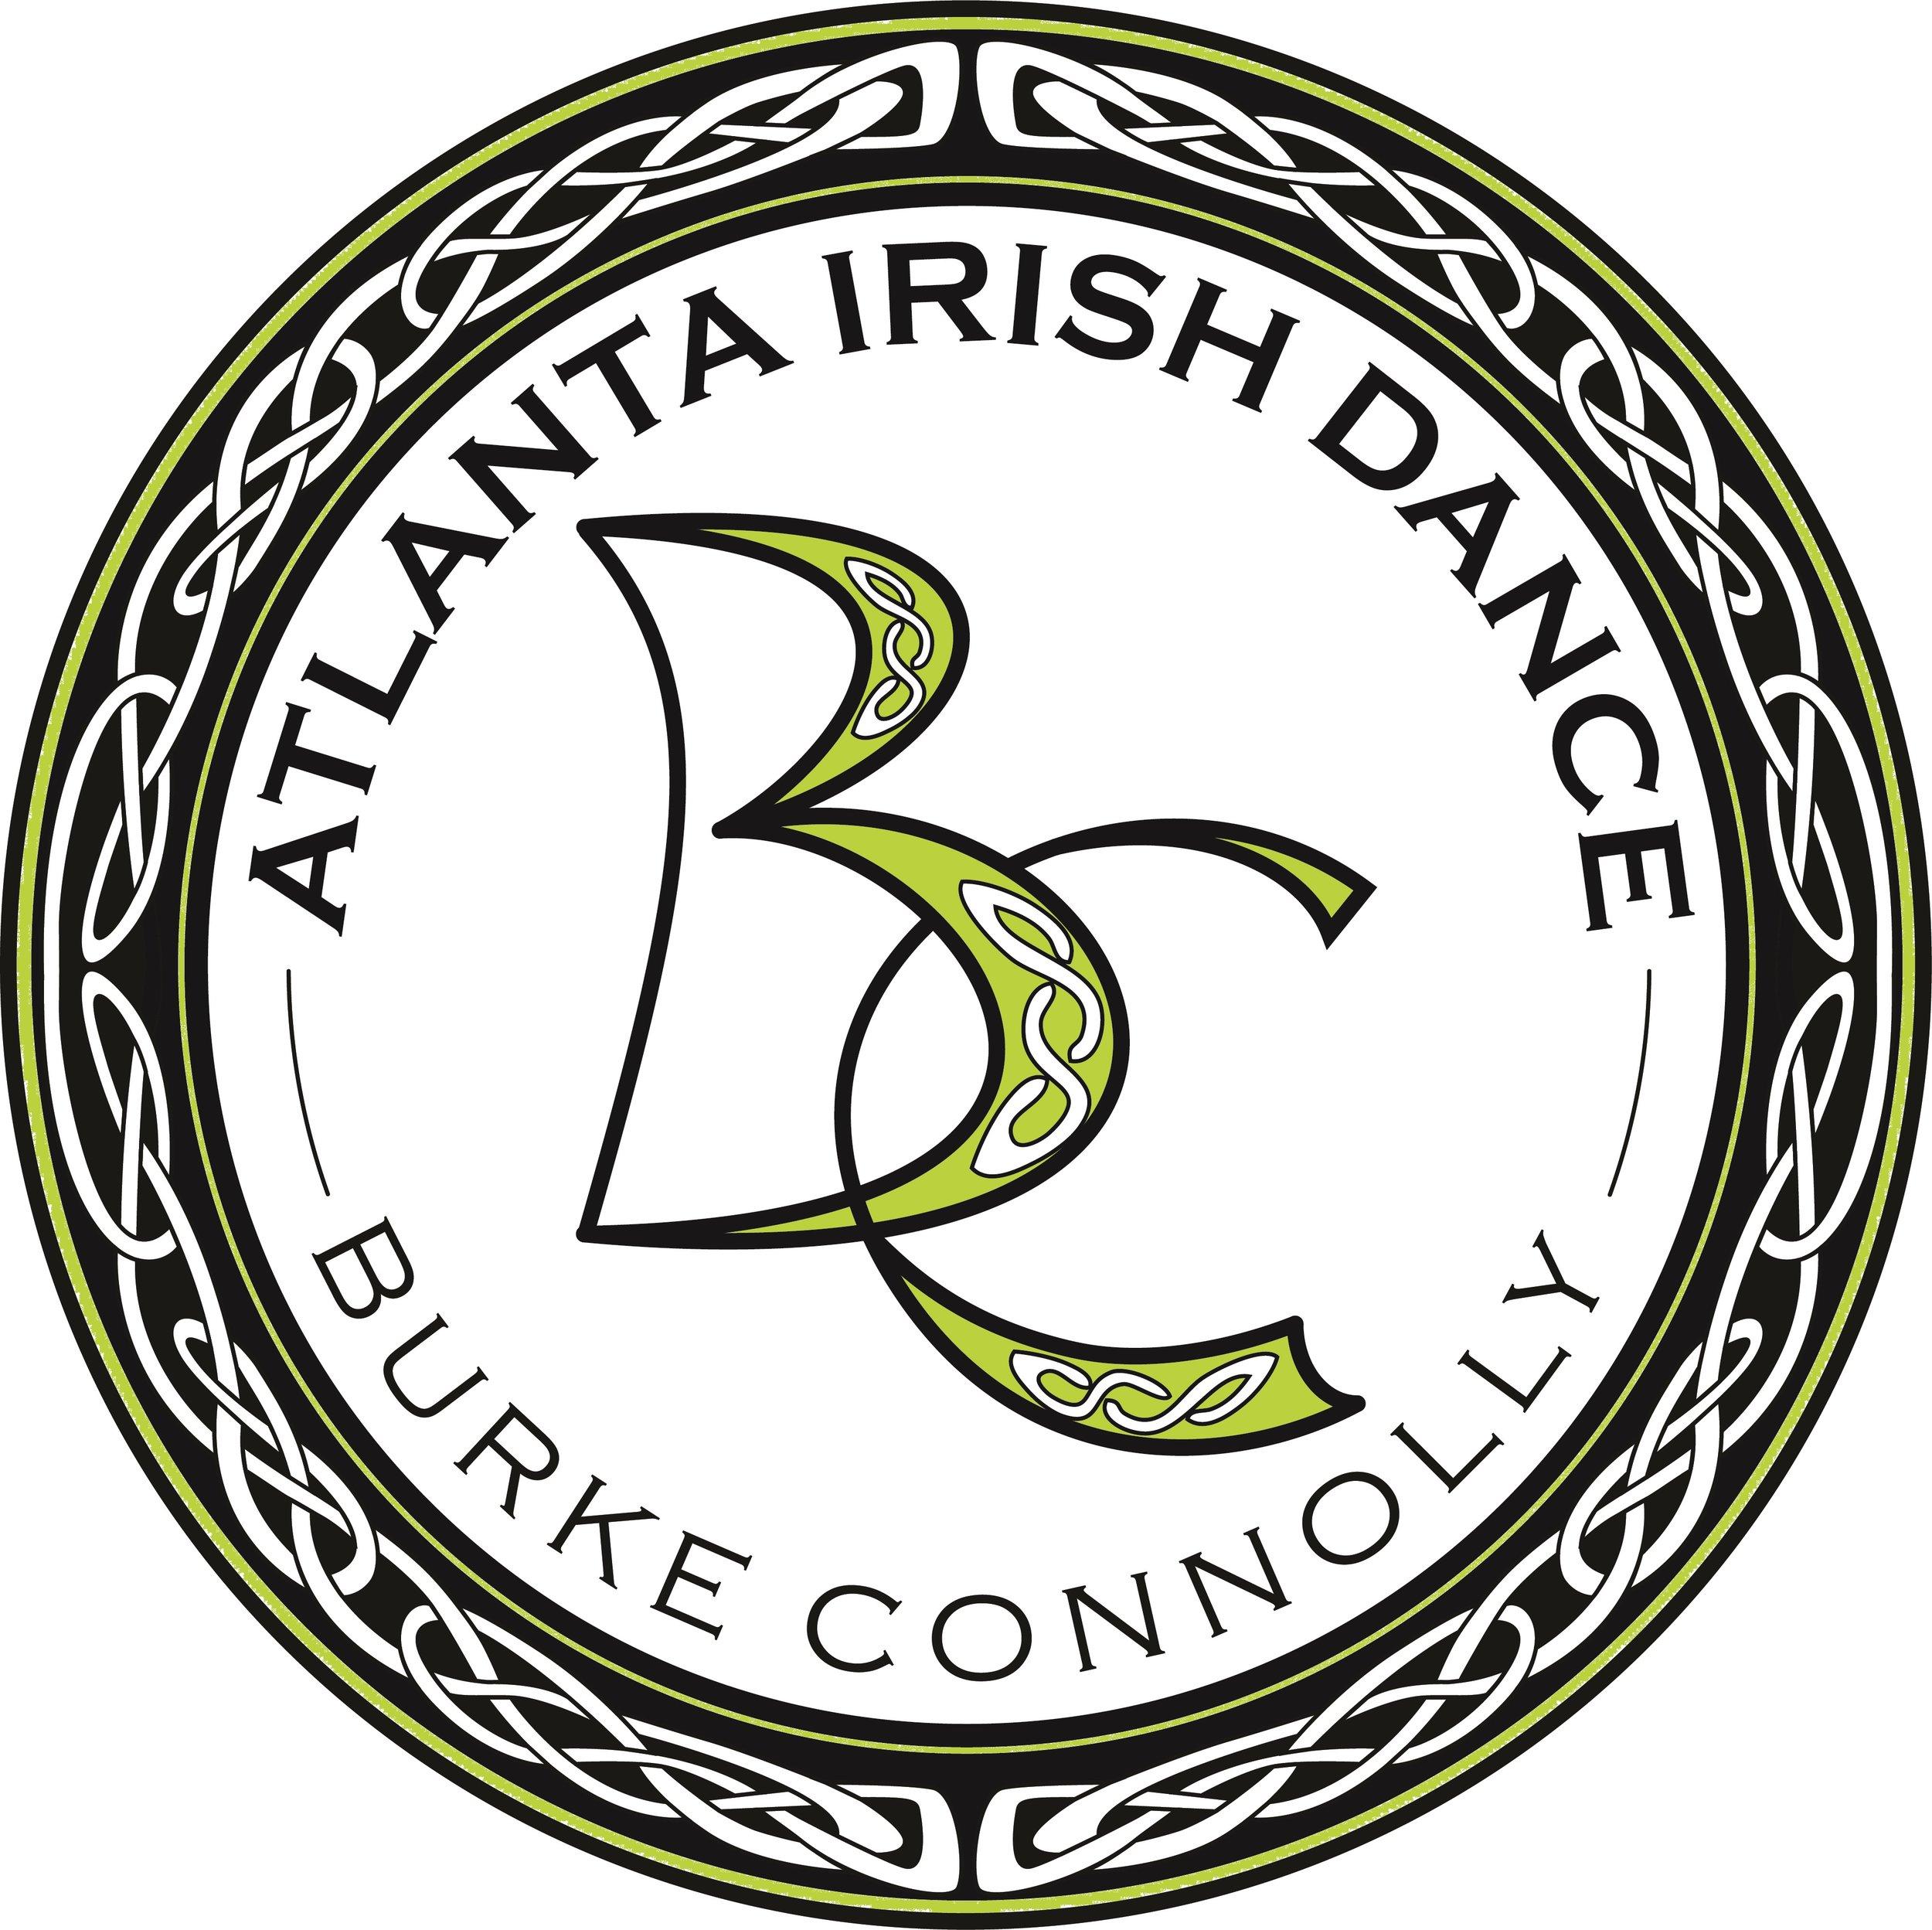 2018 New Logo ATLID_11 w GREEN.jpg